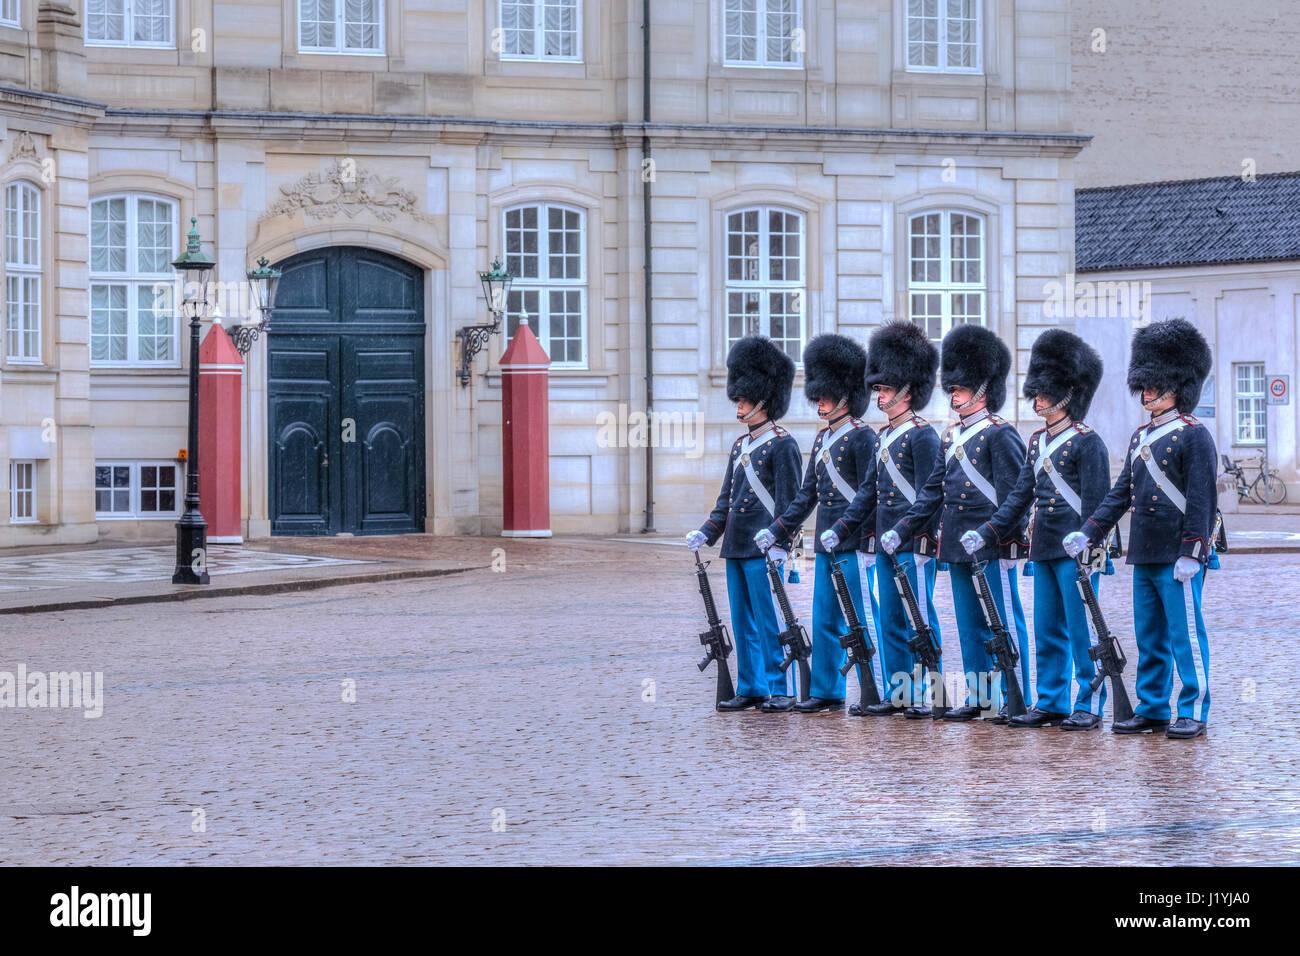 guards at Palace Amalienborg in Copenhagen, Denmark, Scandinavia - Stock Image